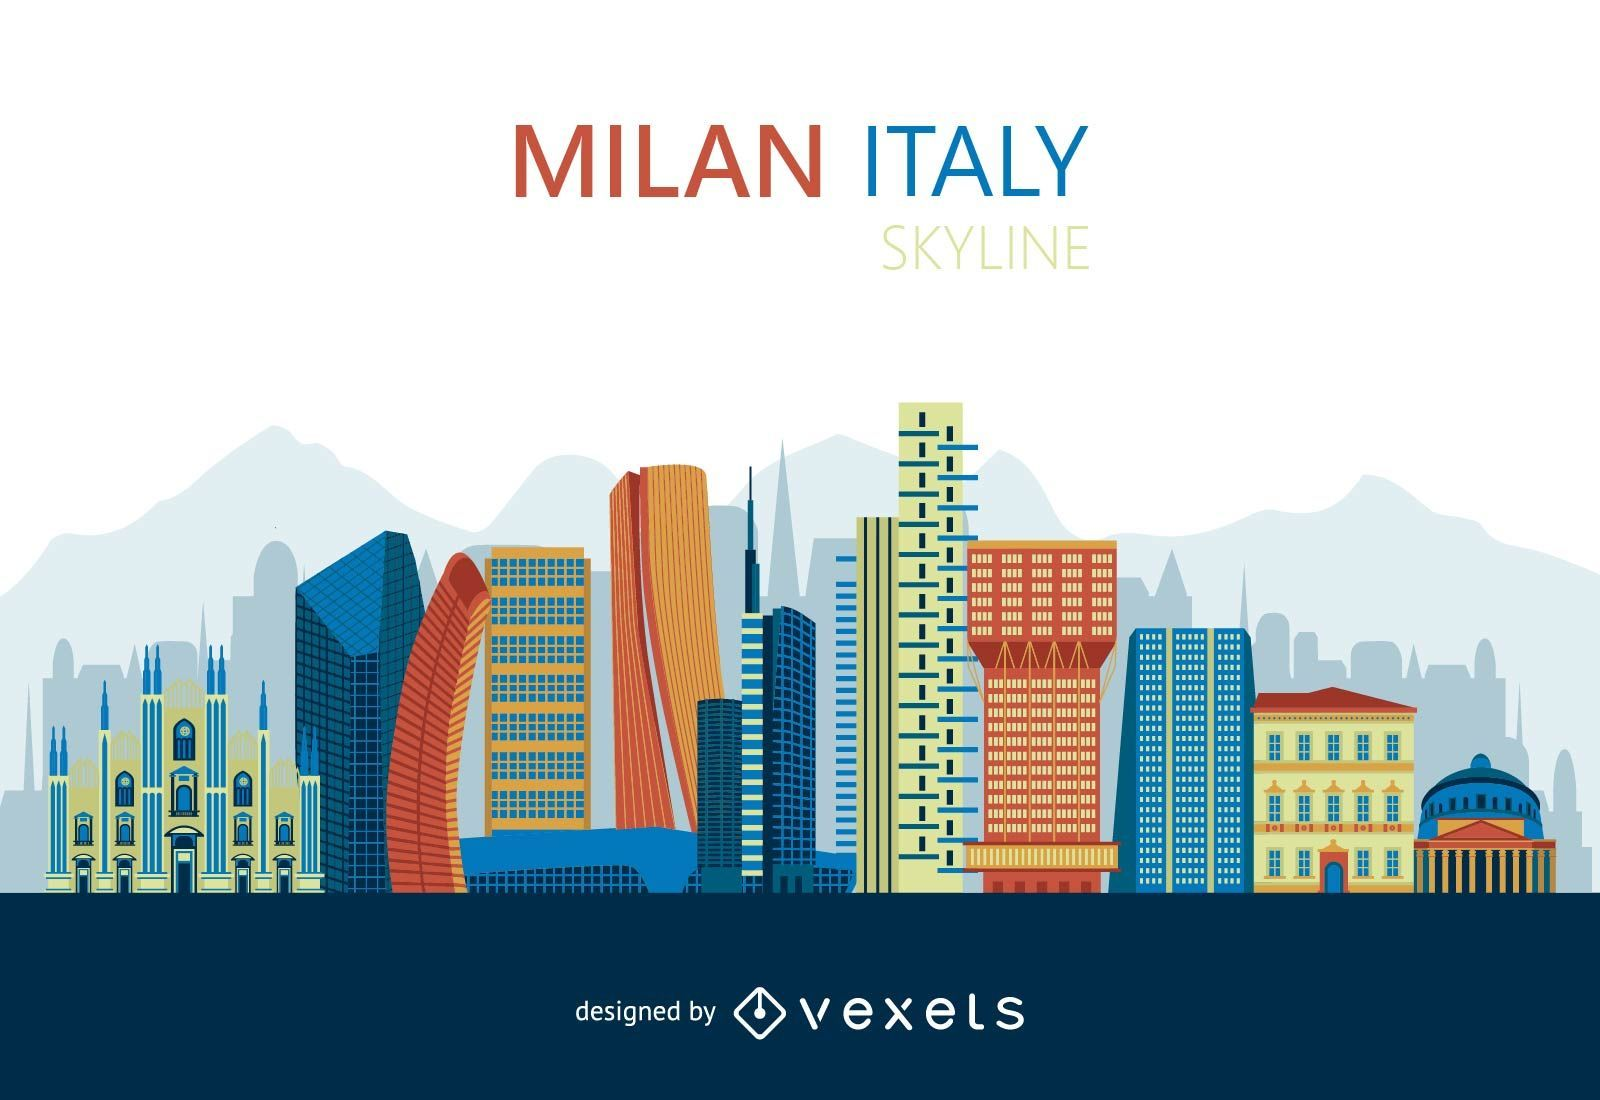 Flat Milan skyline design